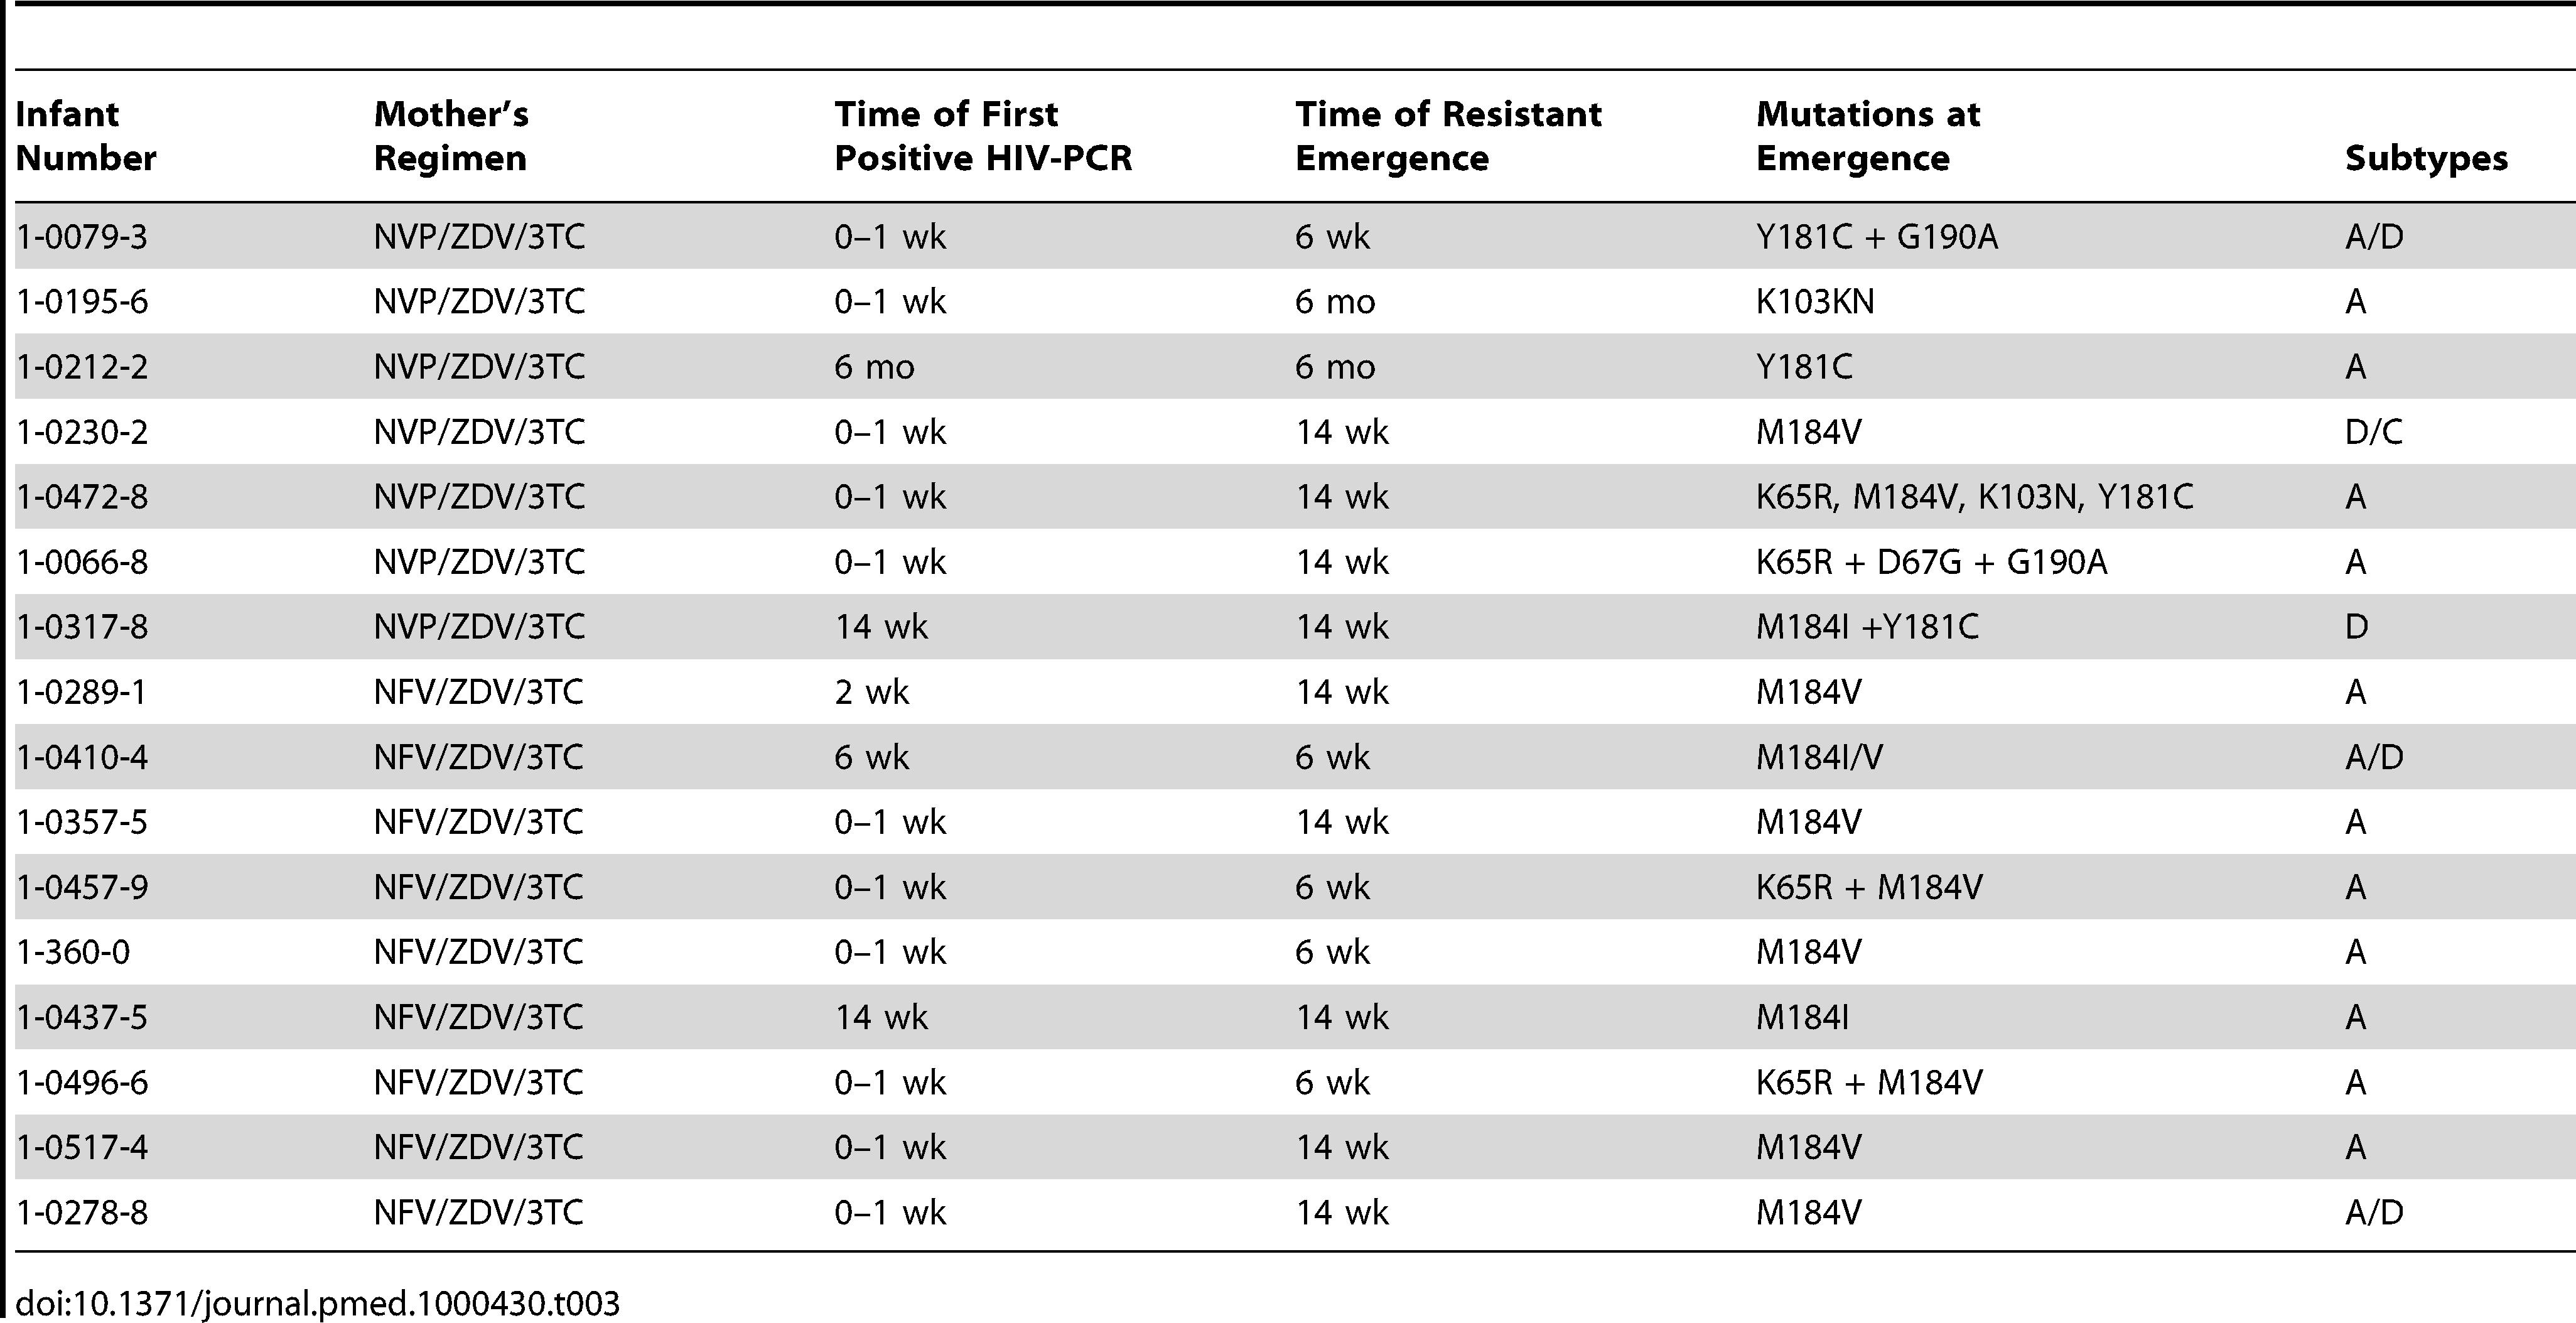 HIV drug resistance mutation patterns among breastfeeding infants at time of emergence.